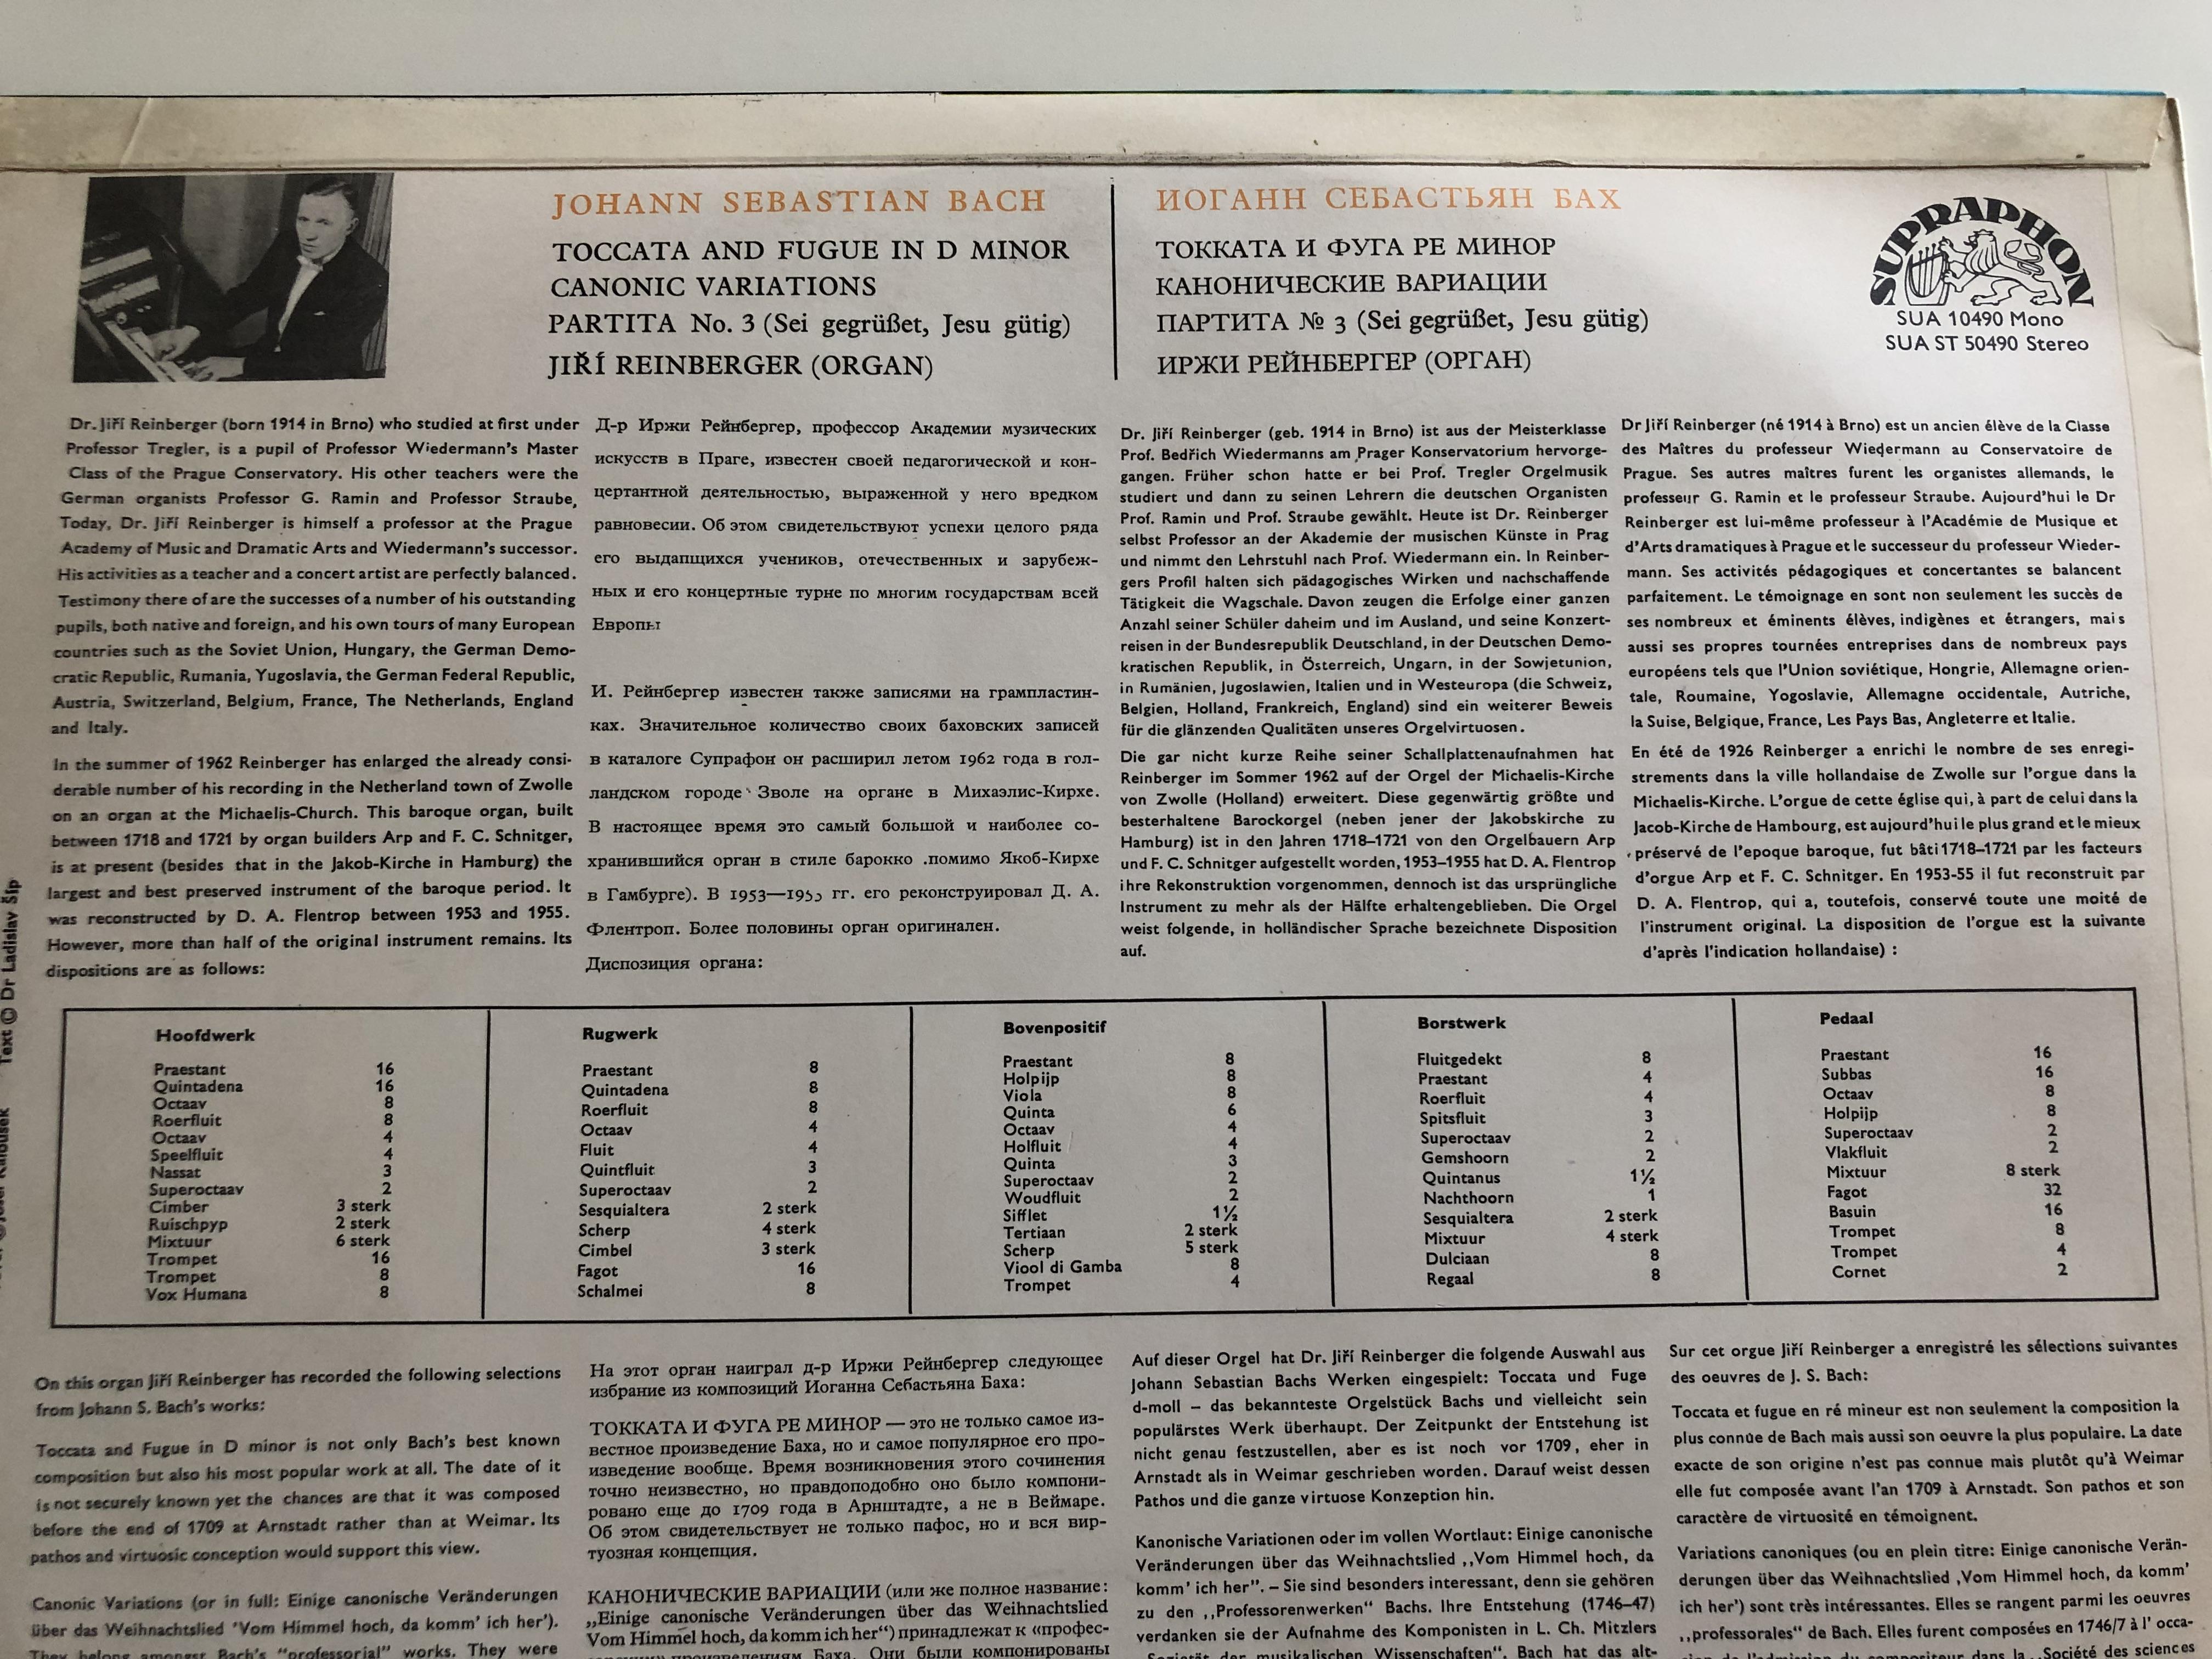 j-s-bach-organ-music-toccata-and-fugue-in-d-minor-partita-no.3-canonic-variations-ji-reinberger-supraphon-lp-stereo-sua-st-50490-sua-10490-3-.jpg